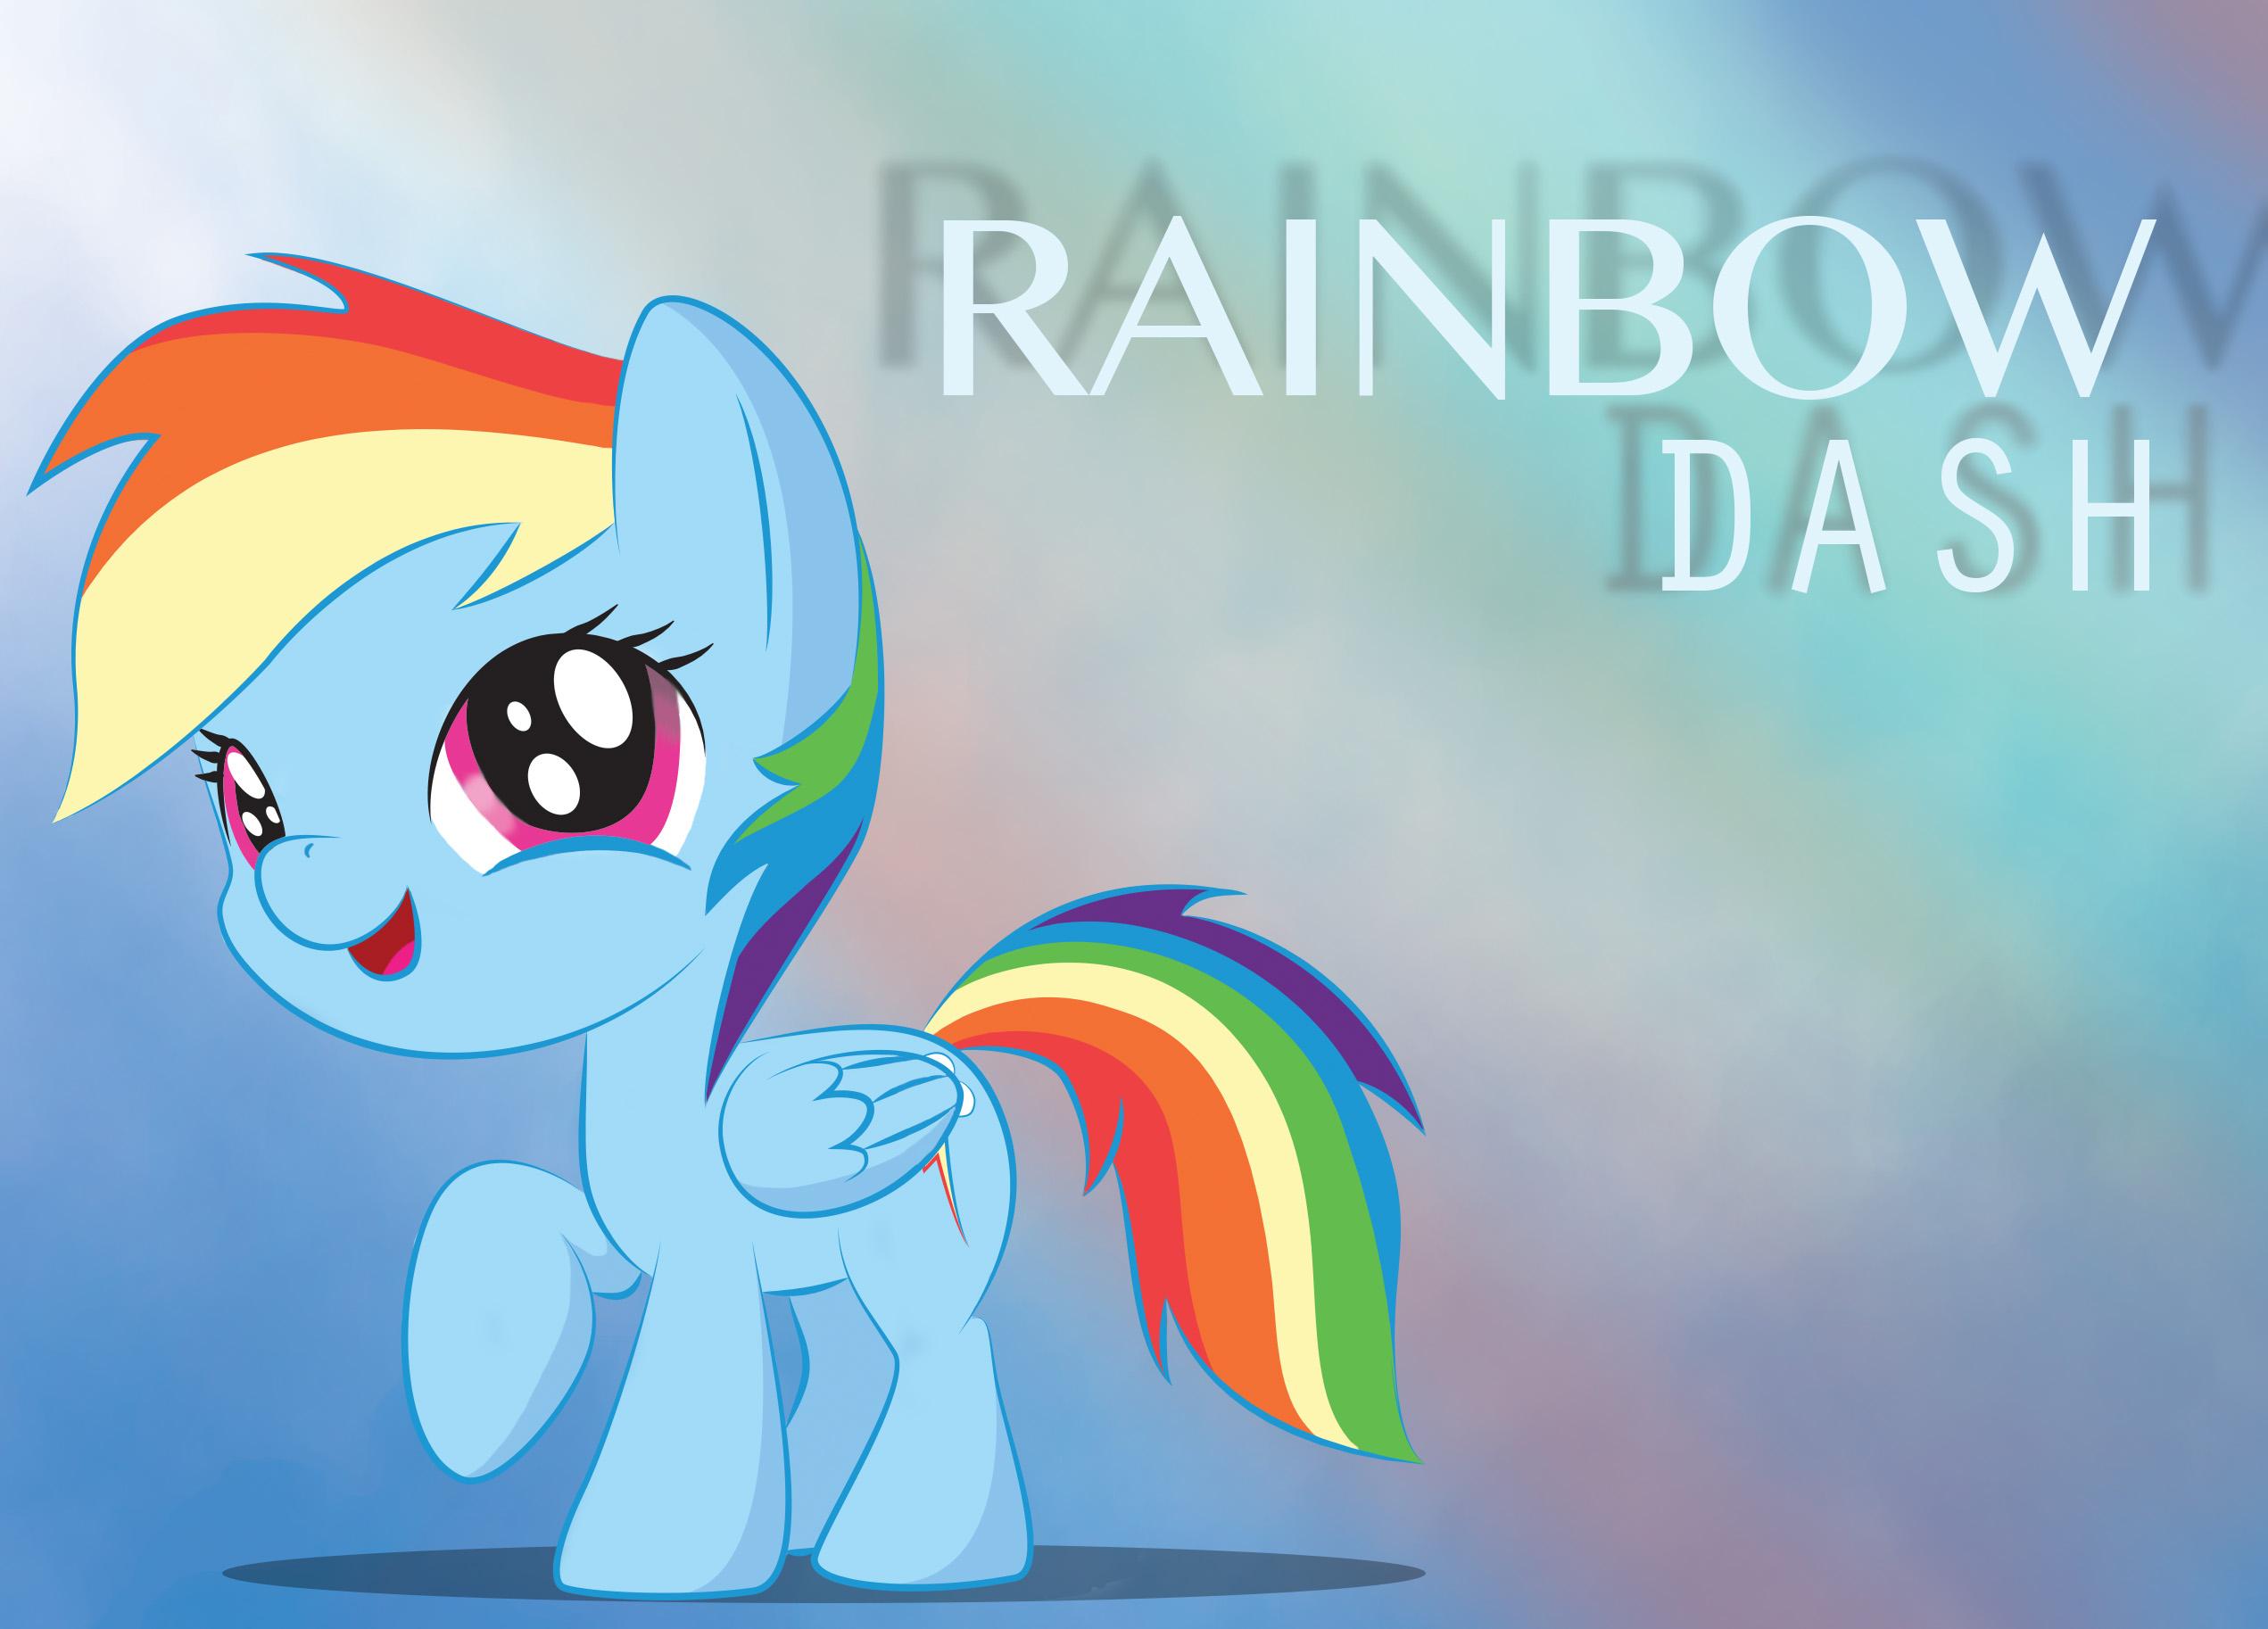 Rainbow Dash Filly by Dashketch on deviantART  Filly Rainbow Dash And Derpy